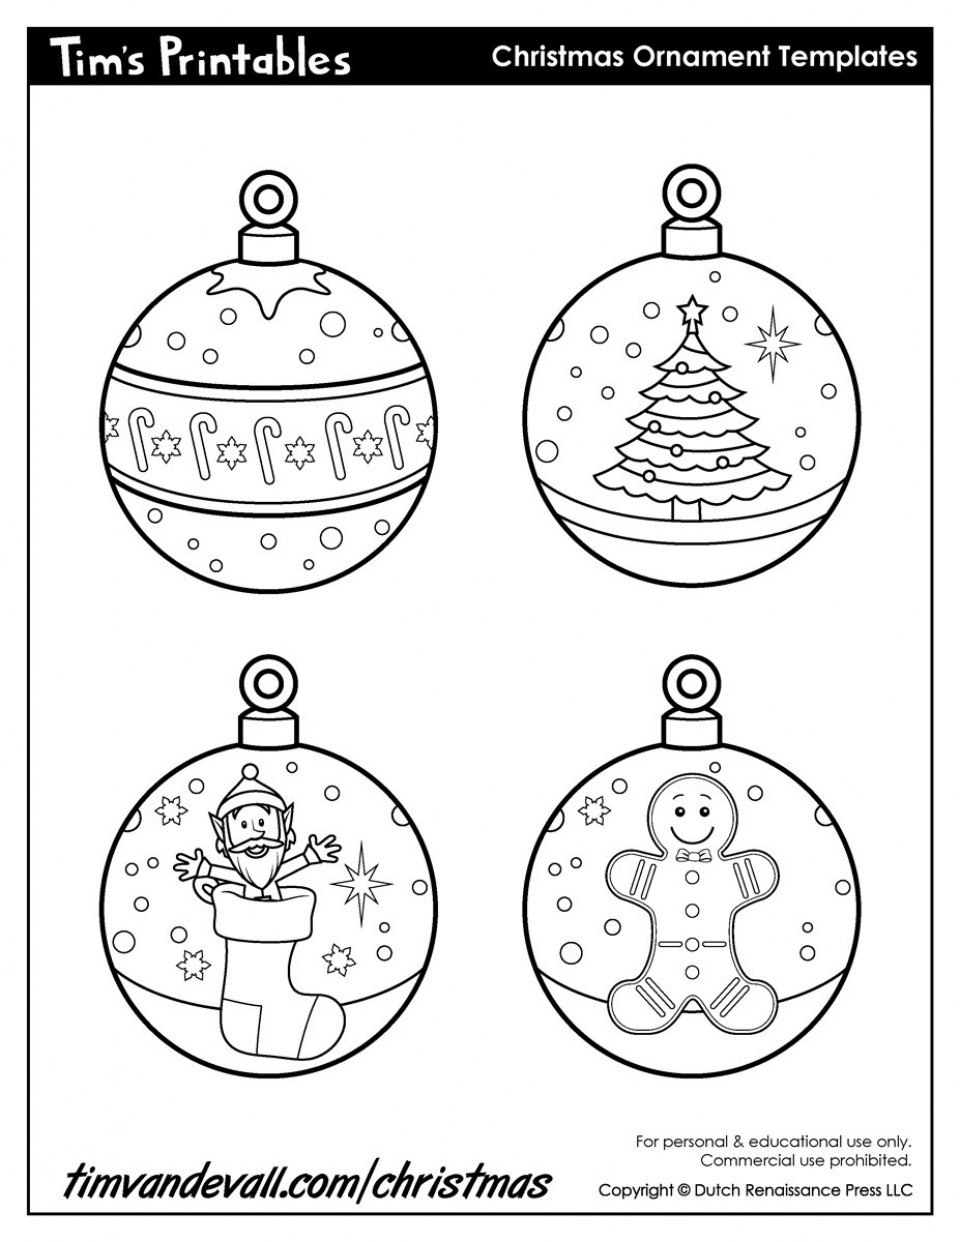 005 Printable Christmas Ornament Templates Paper Ornamentsssl1 - Free Printable Christmas Ornaments